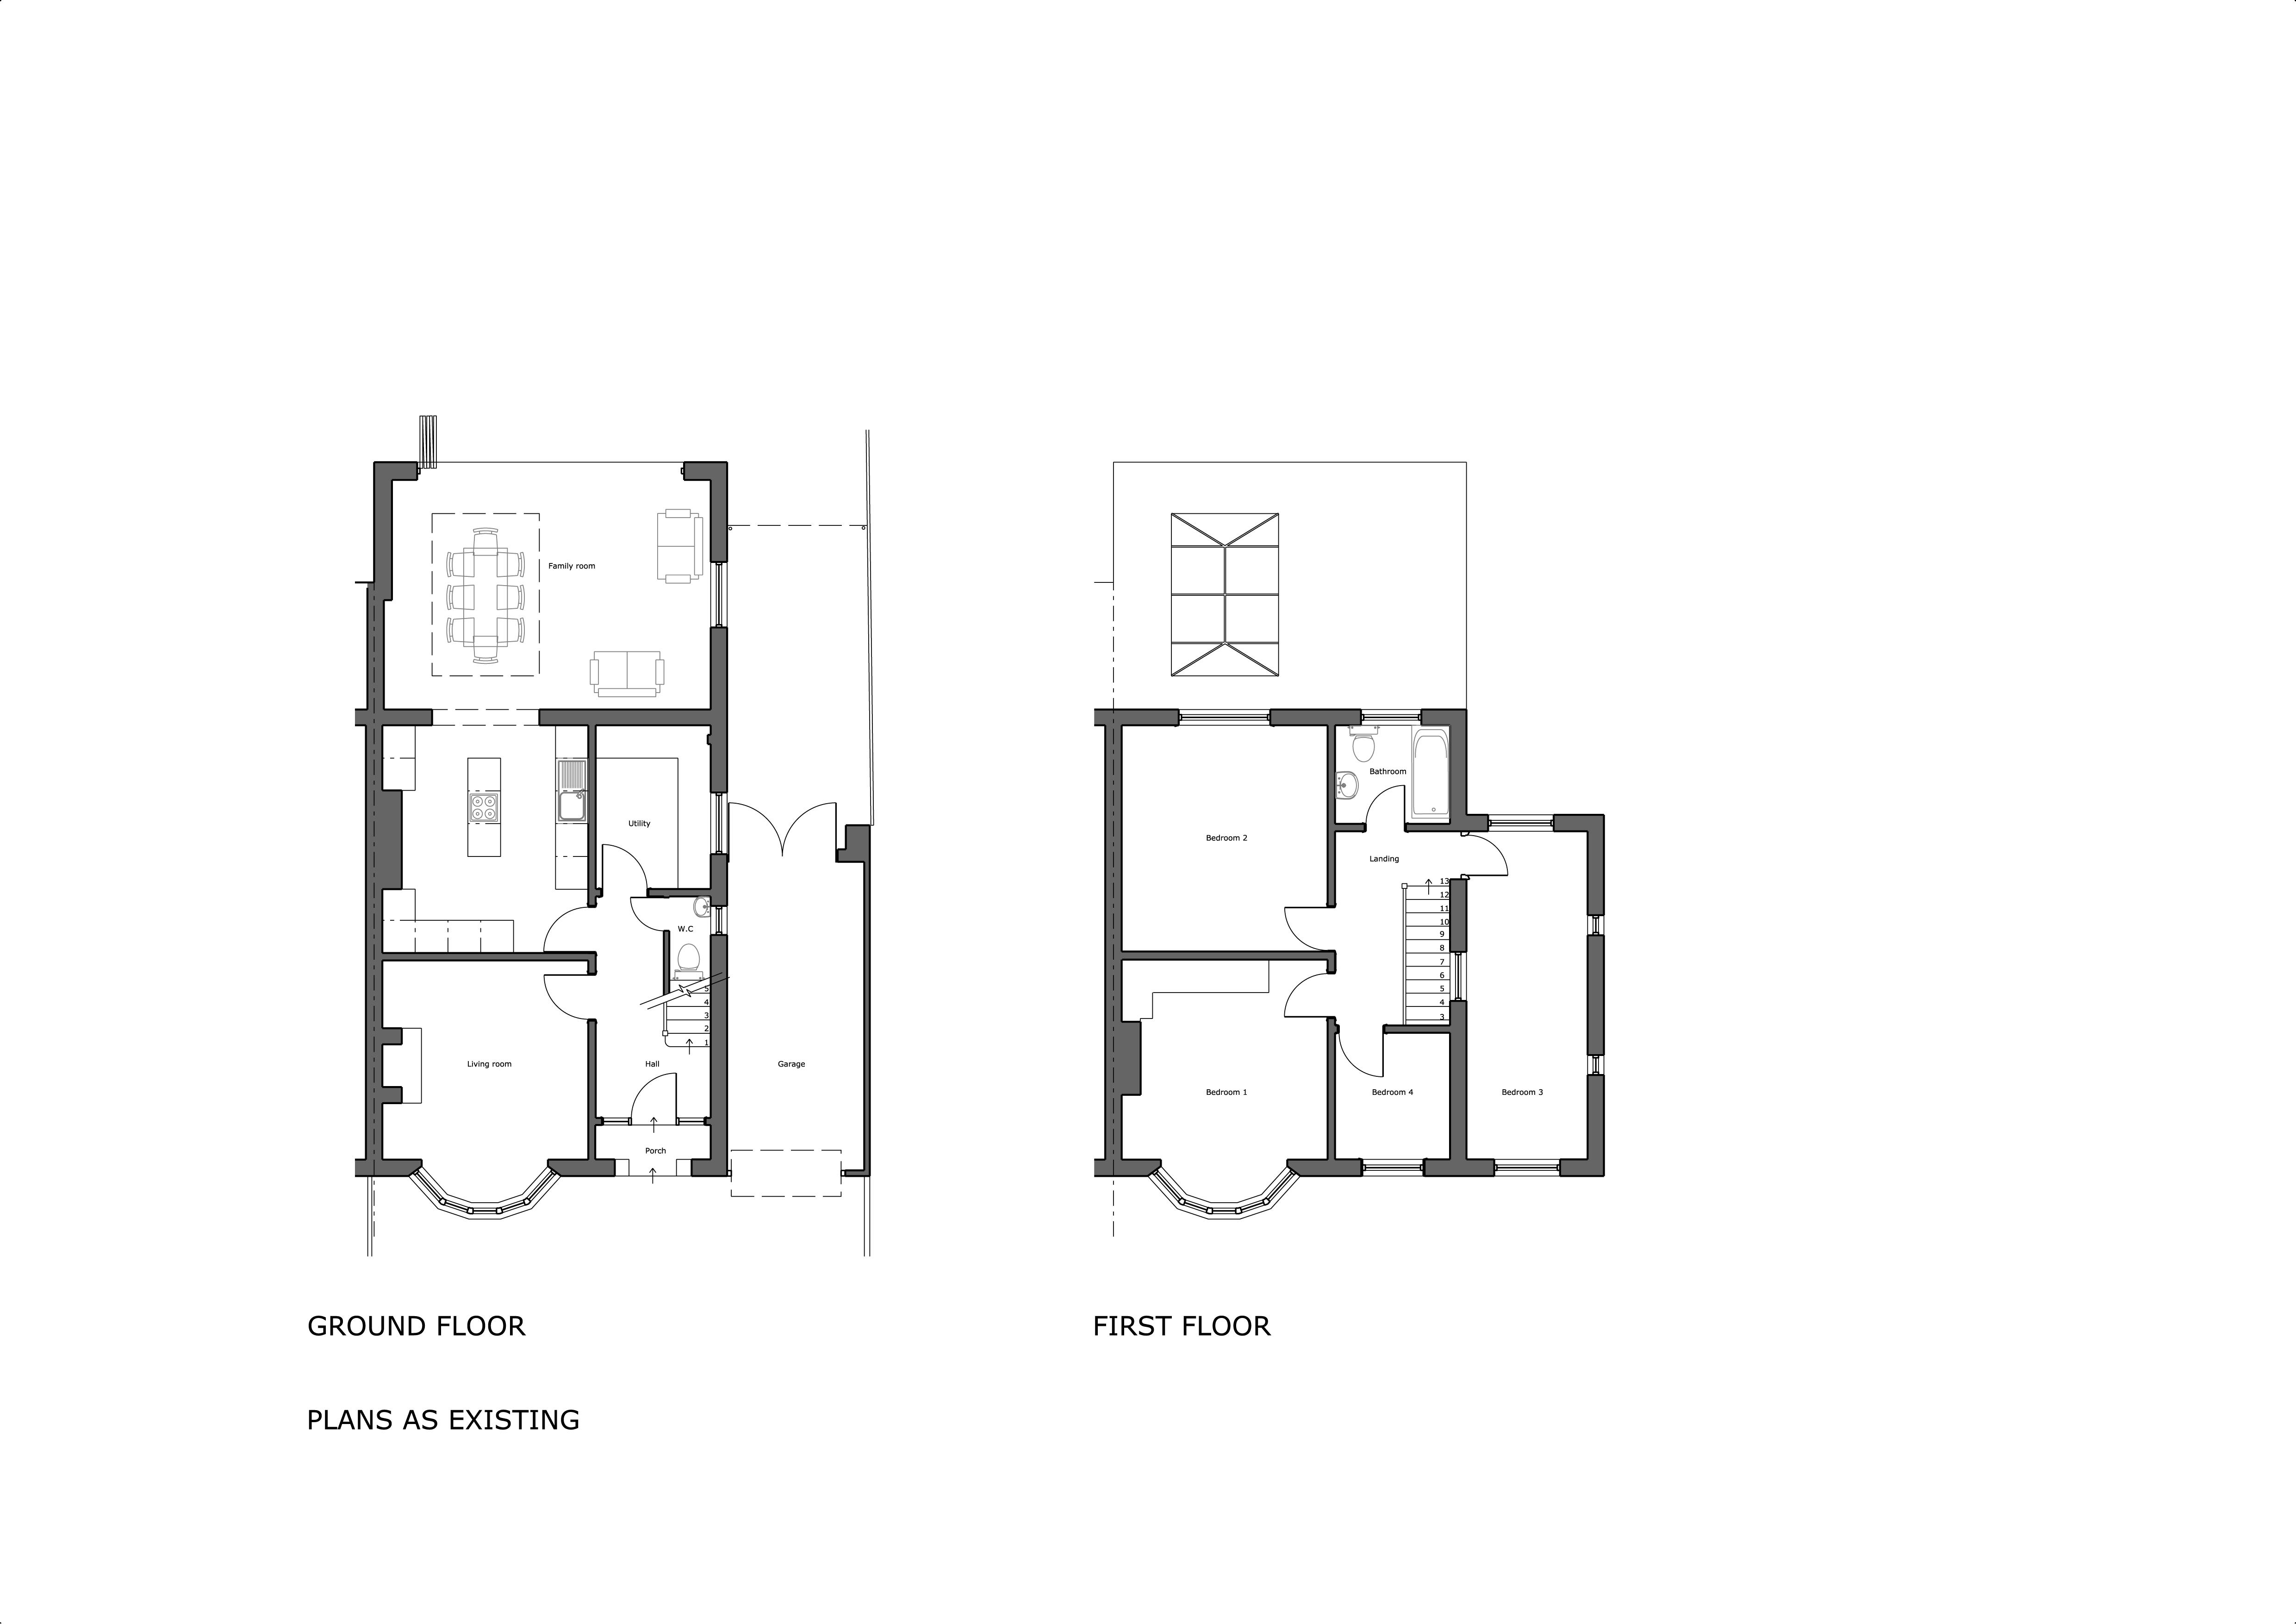 255 Ledbury Rd Proposed Plans